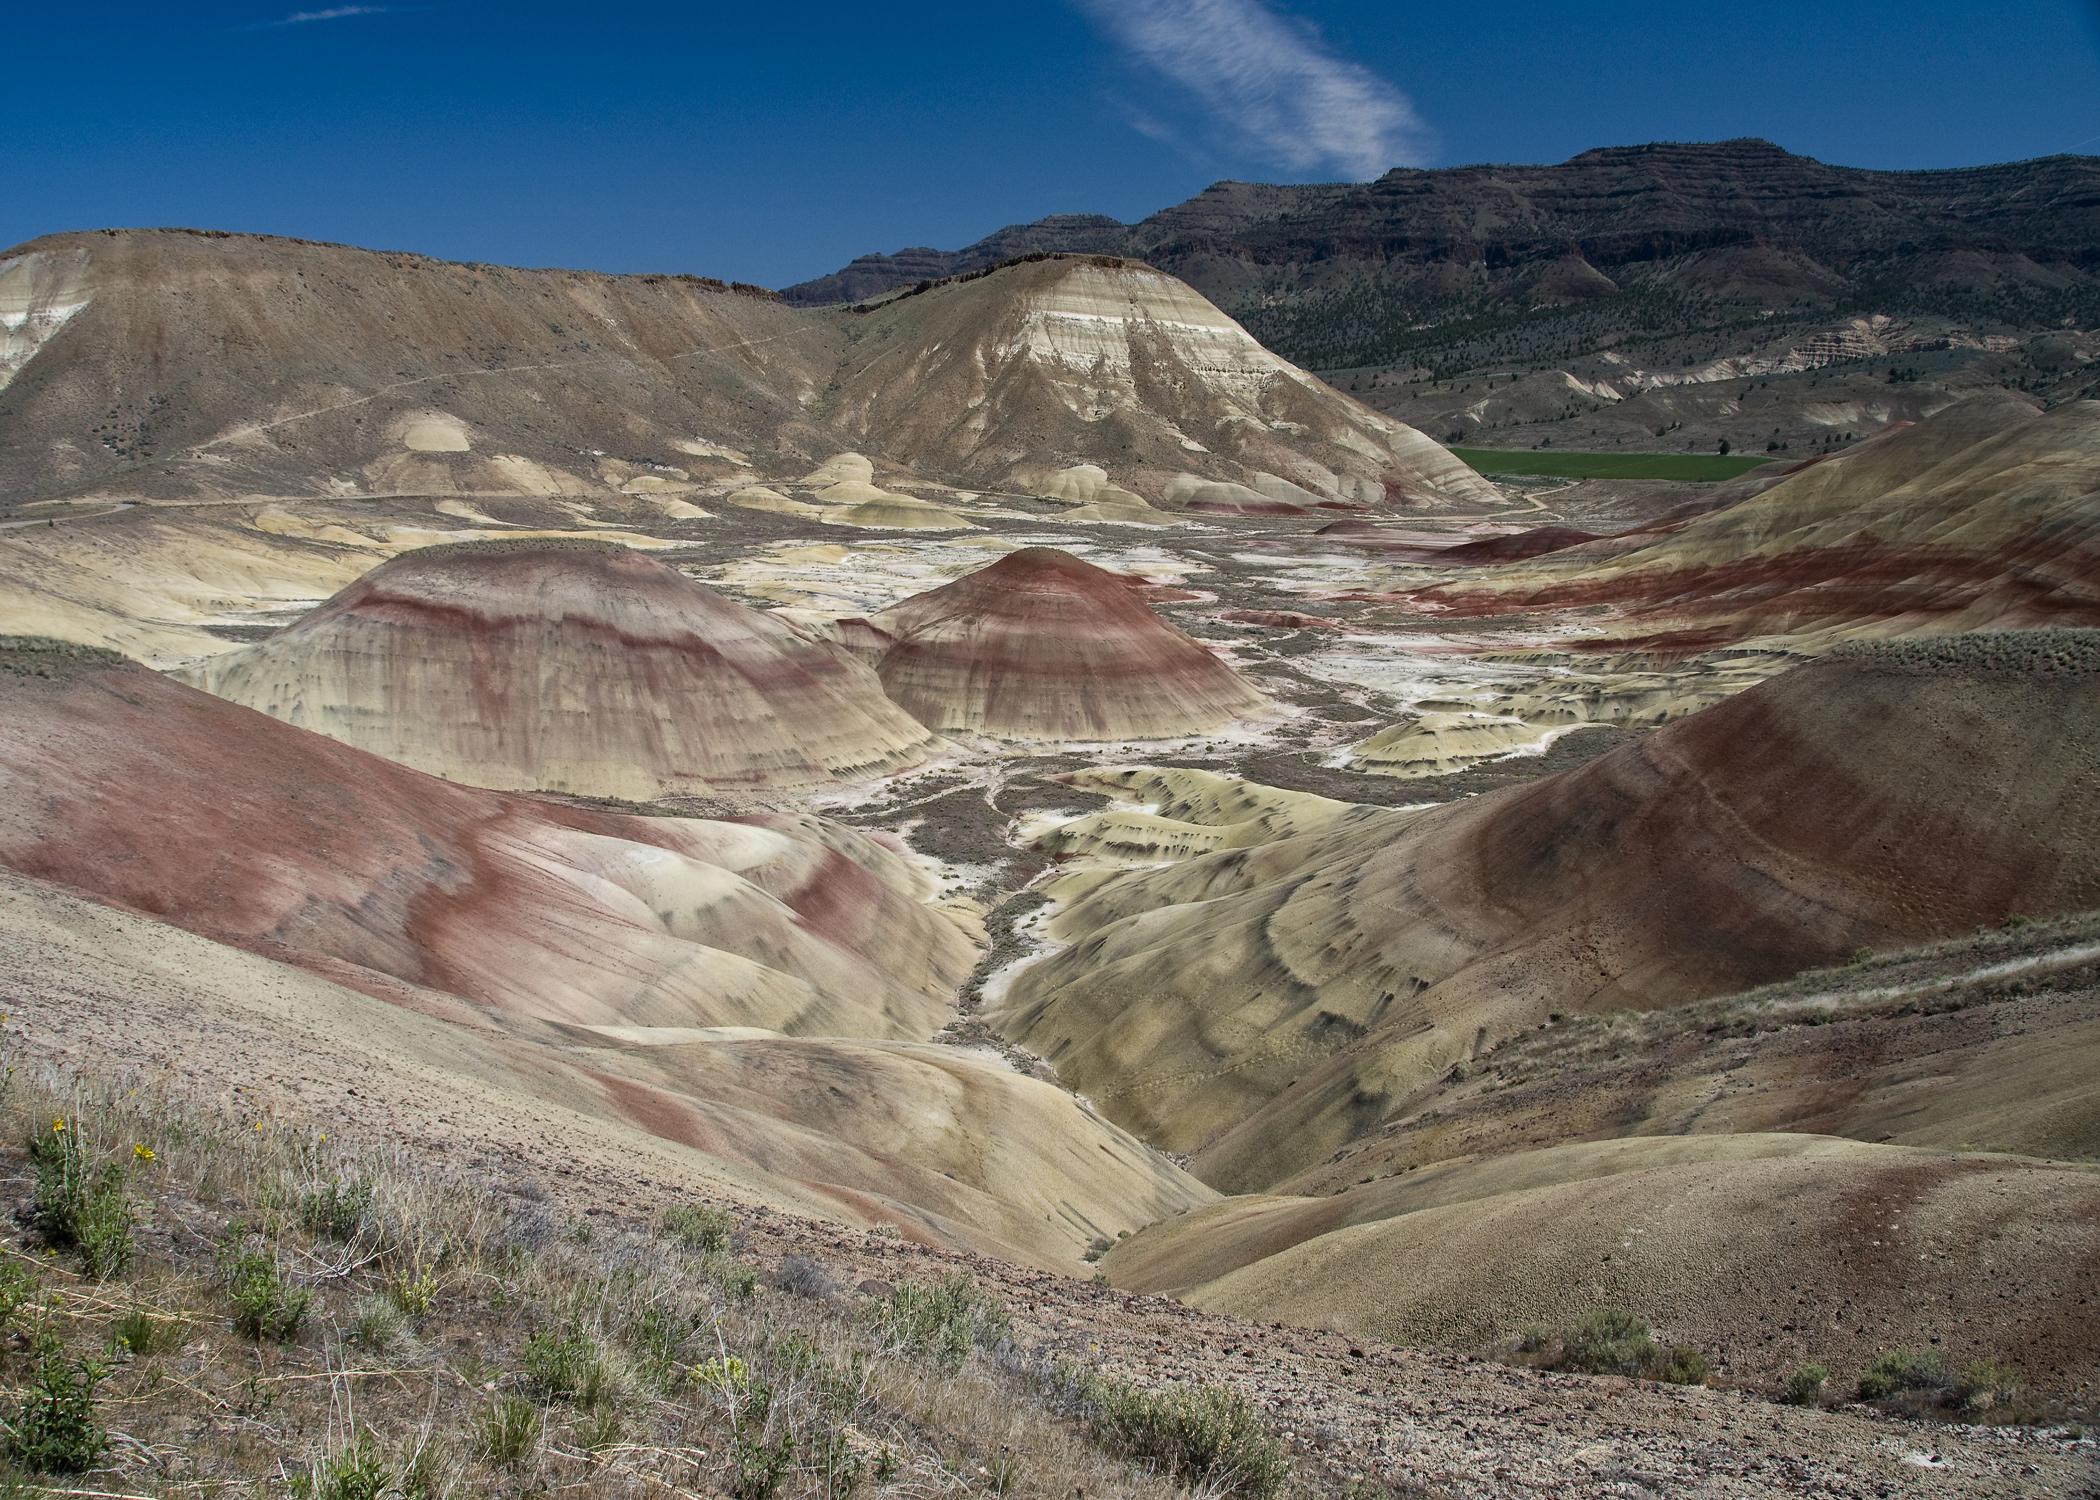 Painted Hills (JDNP)